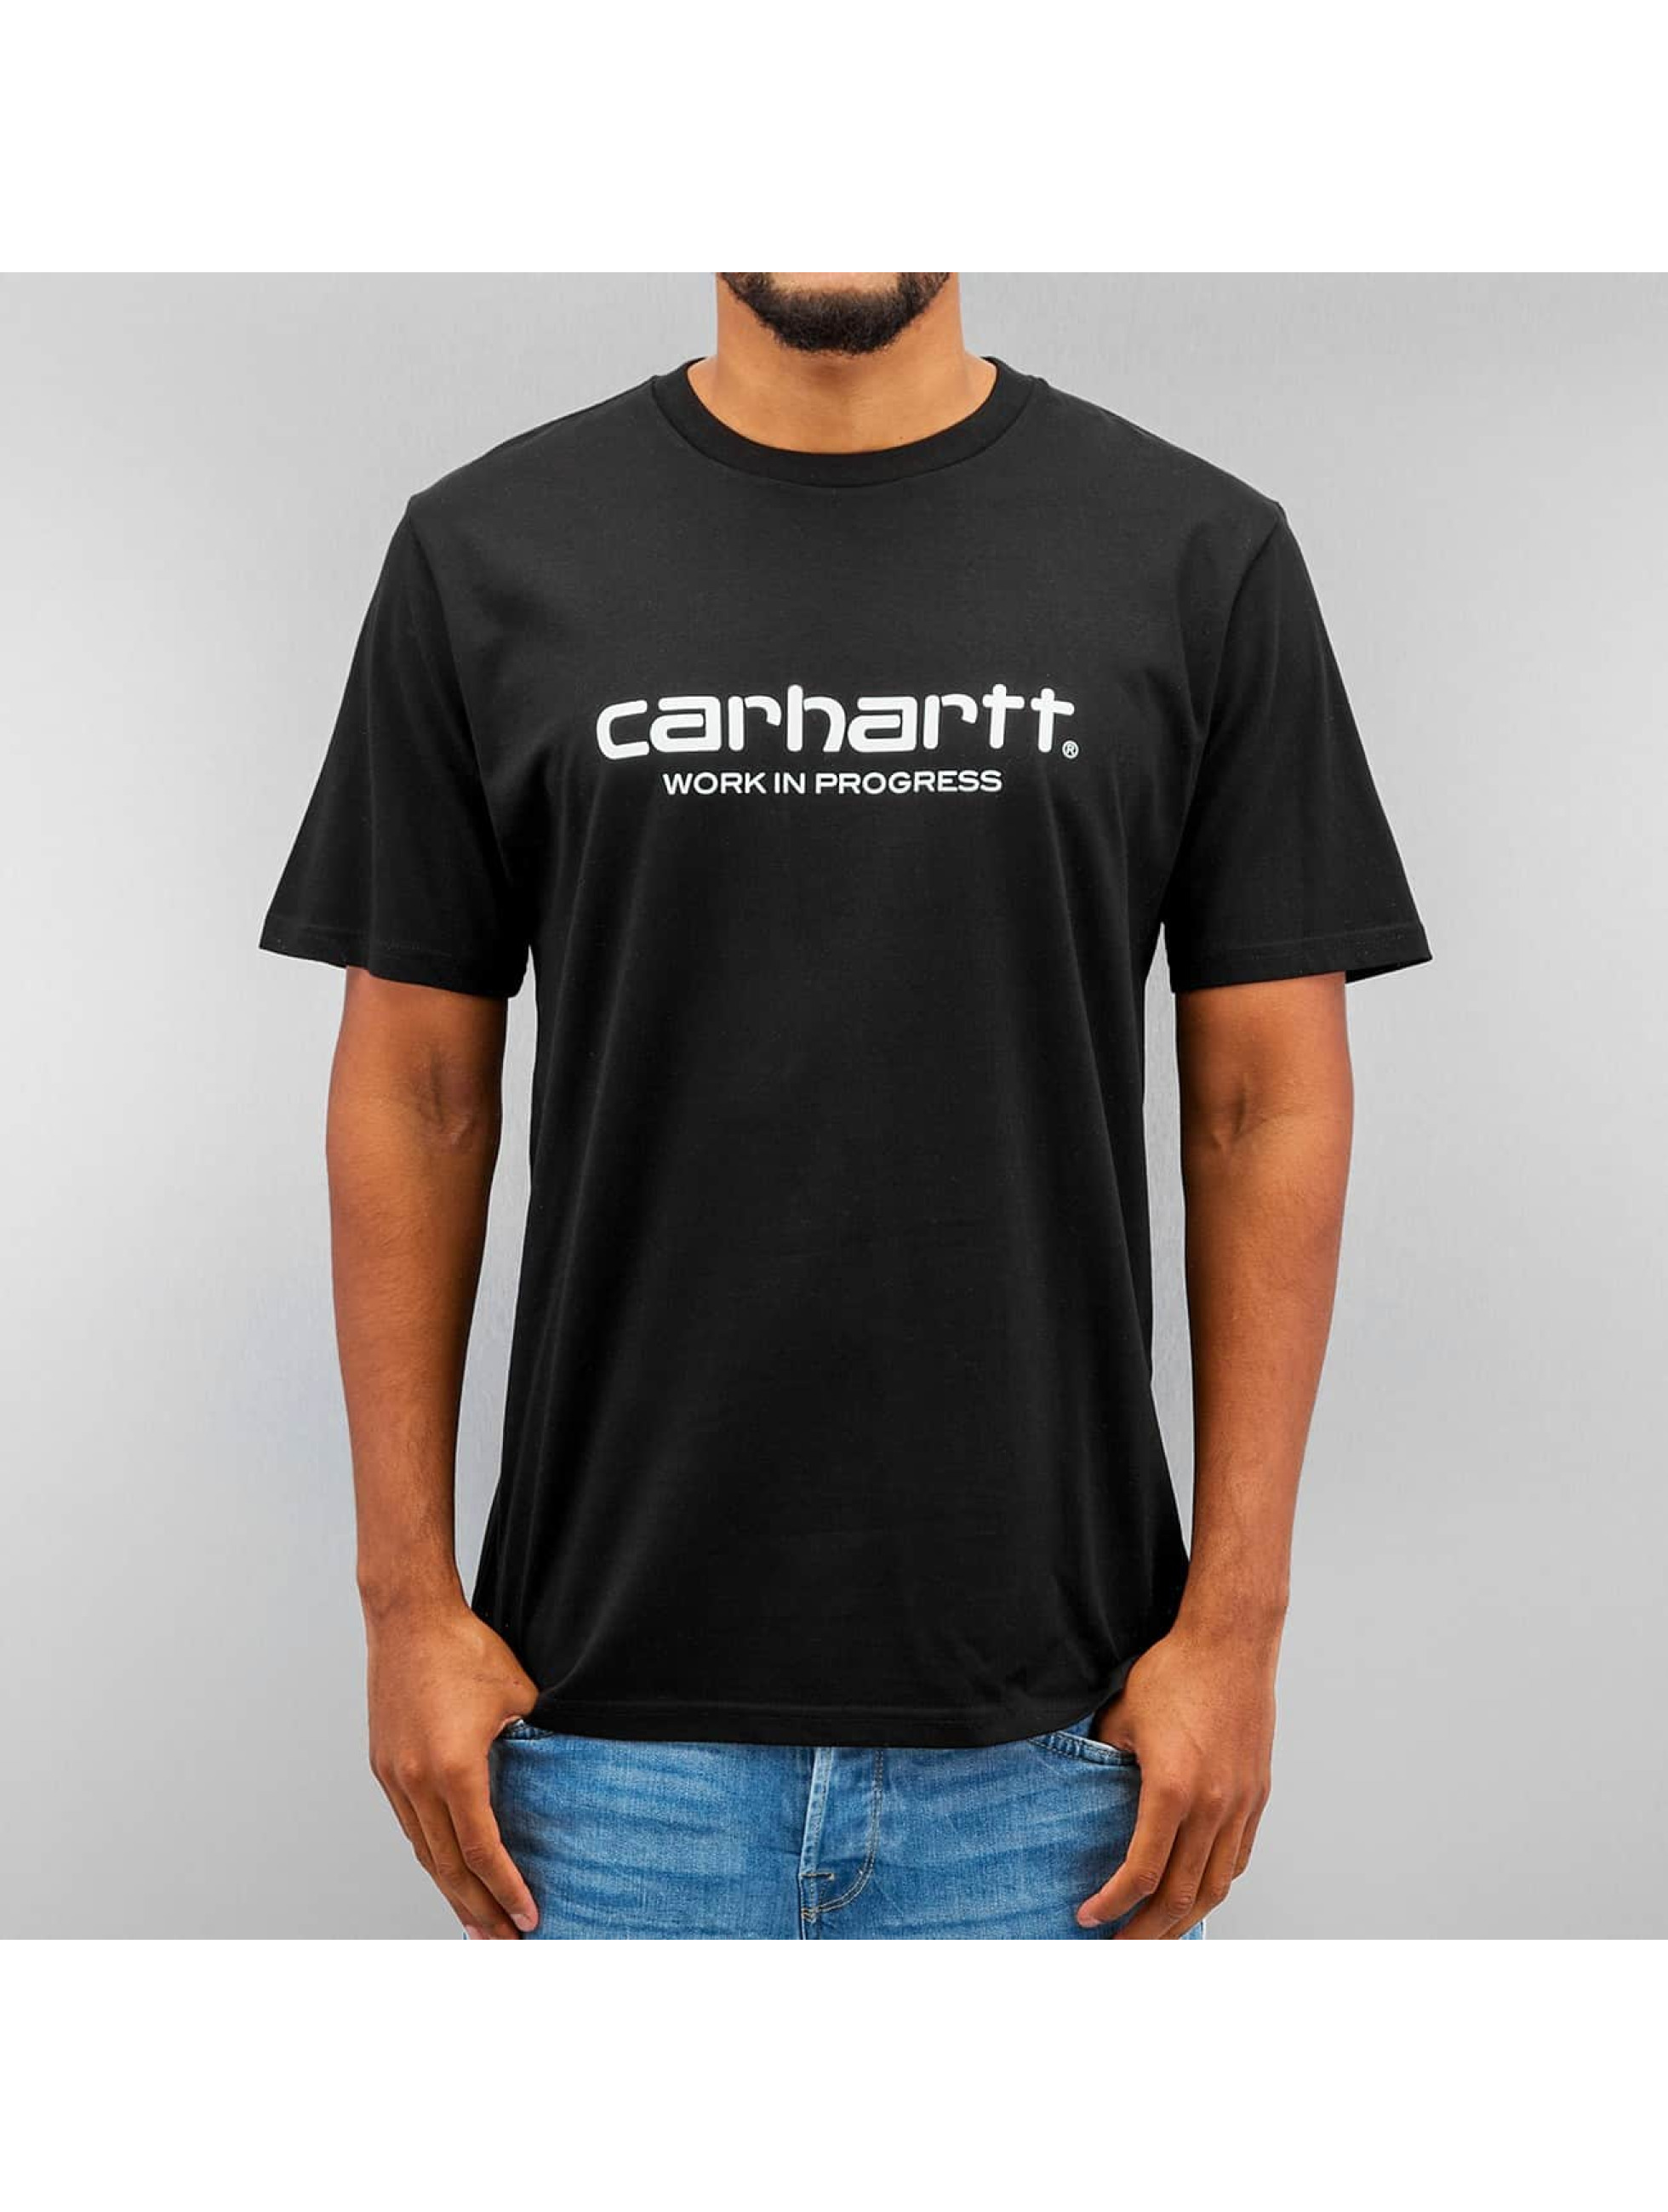 Carhartt WIP T-Shirt S/S Wip Script black